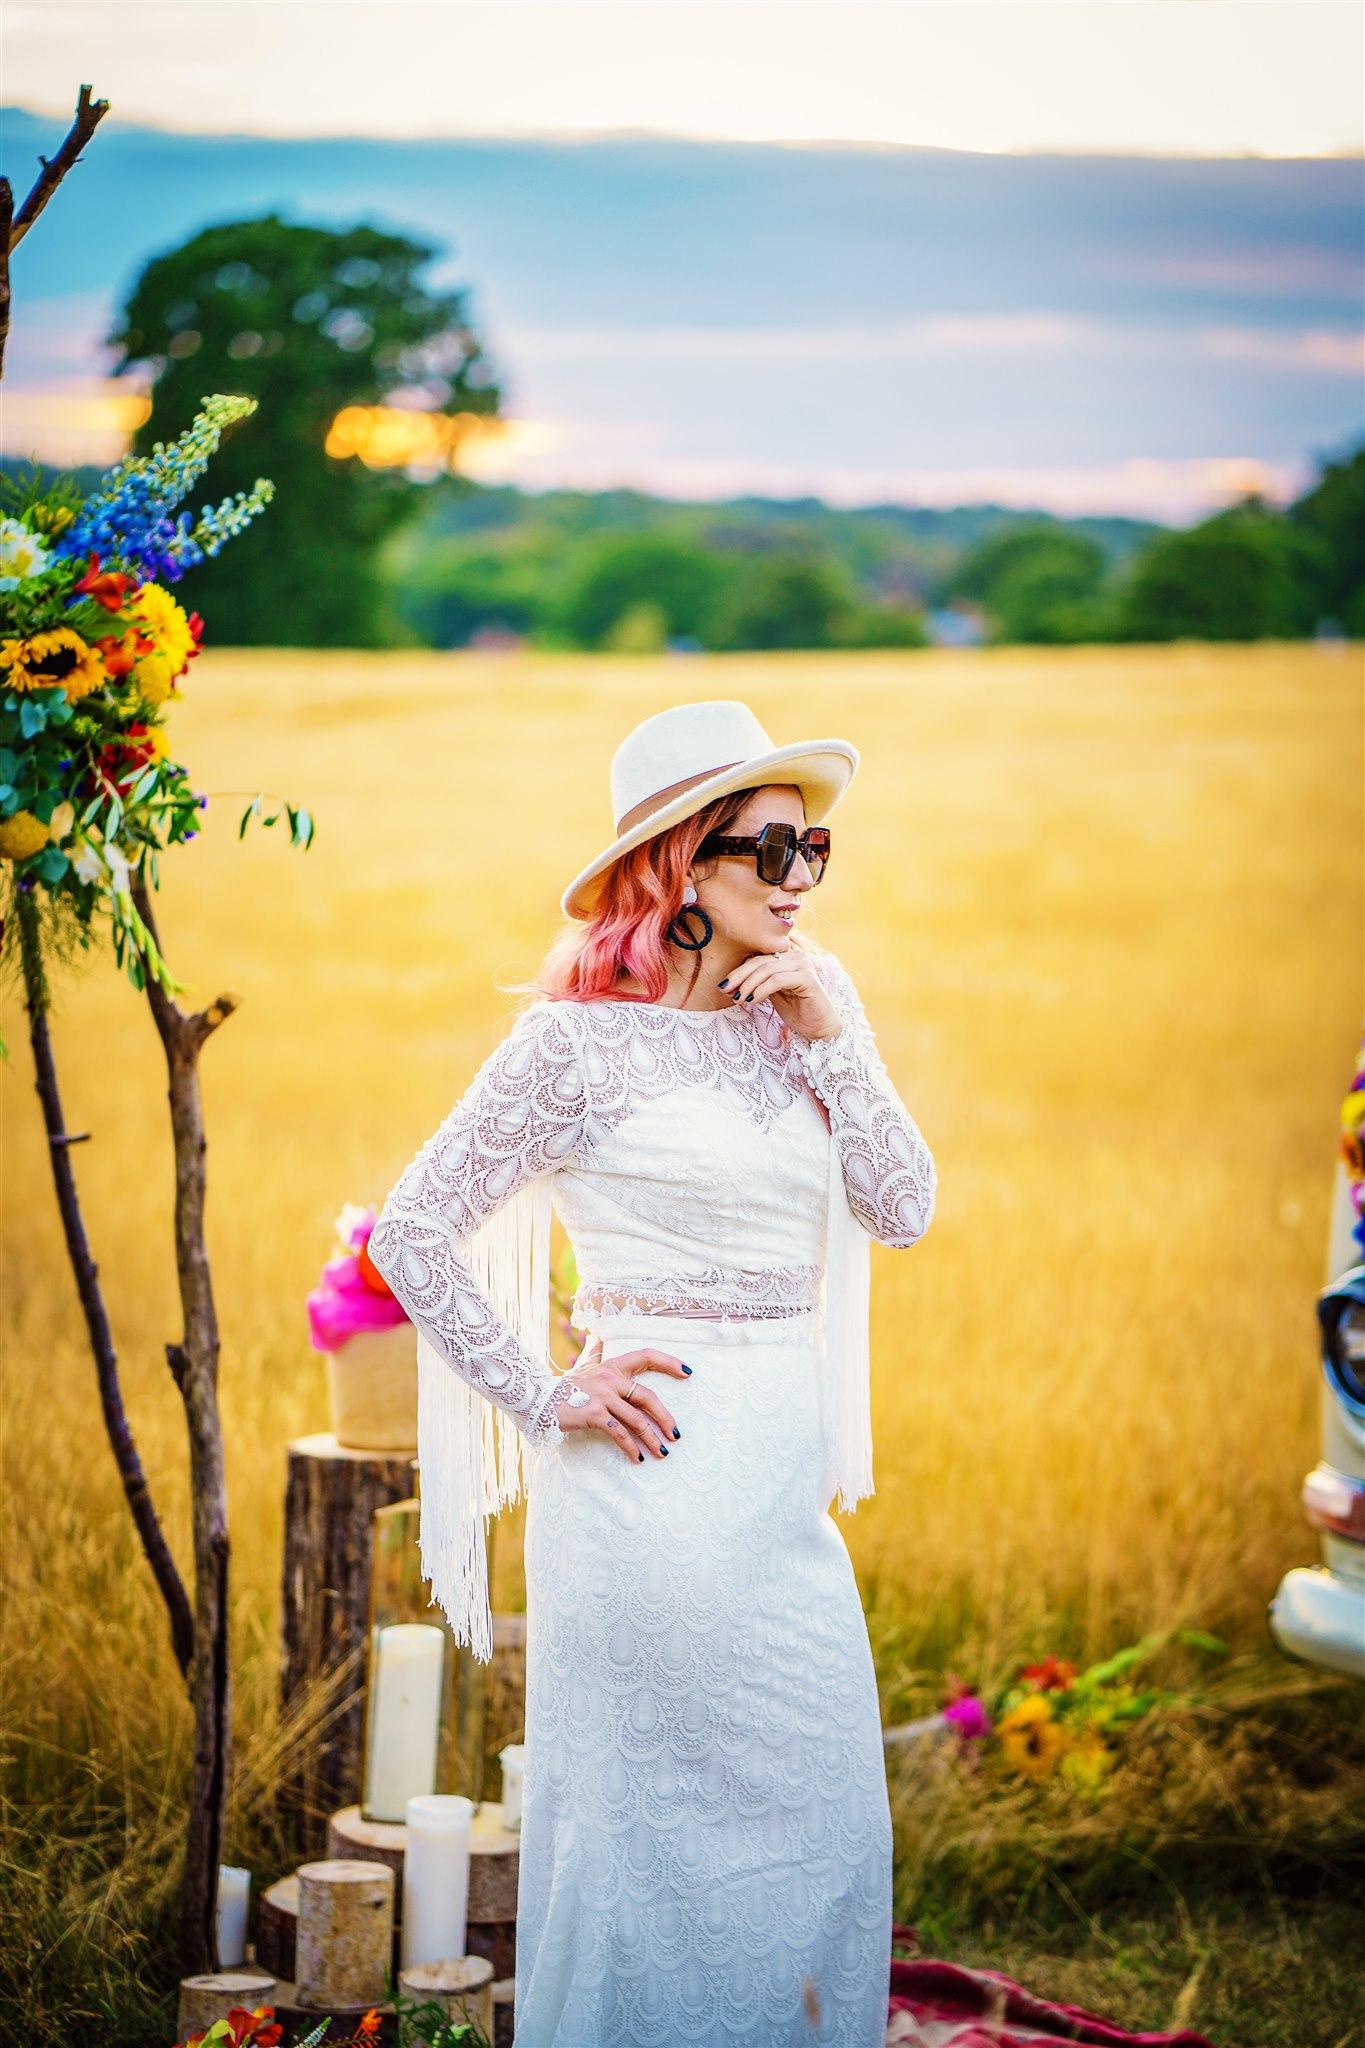 70s wedding look - bohemian wedding dress - colourful bohemian wedding - 70s wedding - campervan wedding - hippie wedding